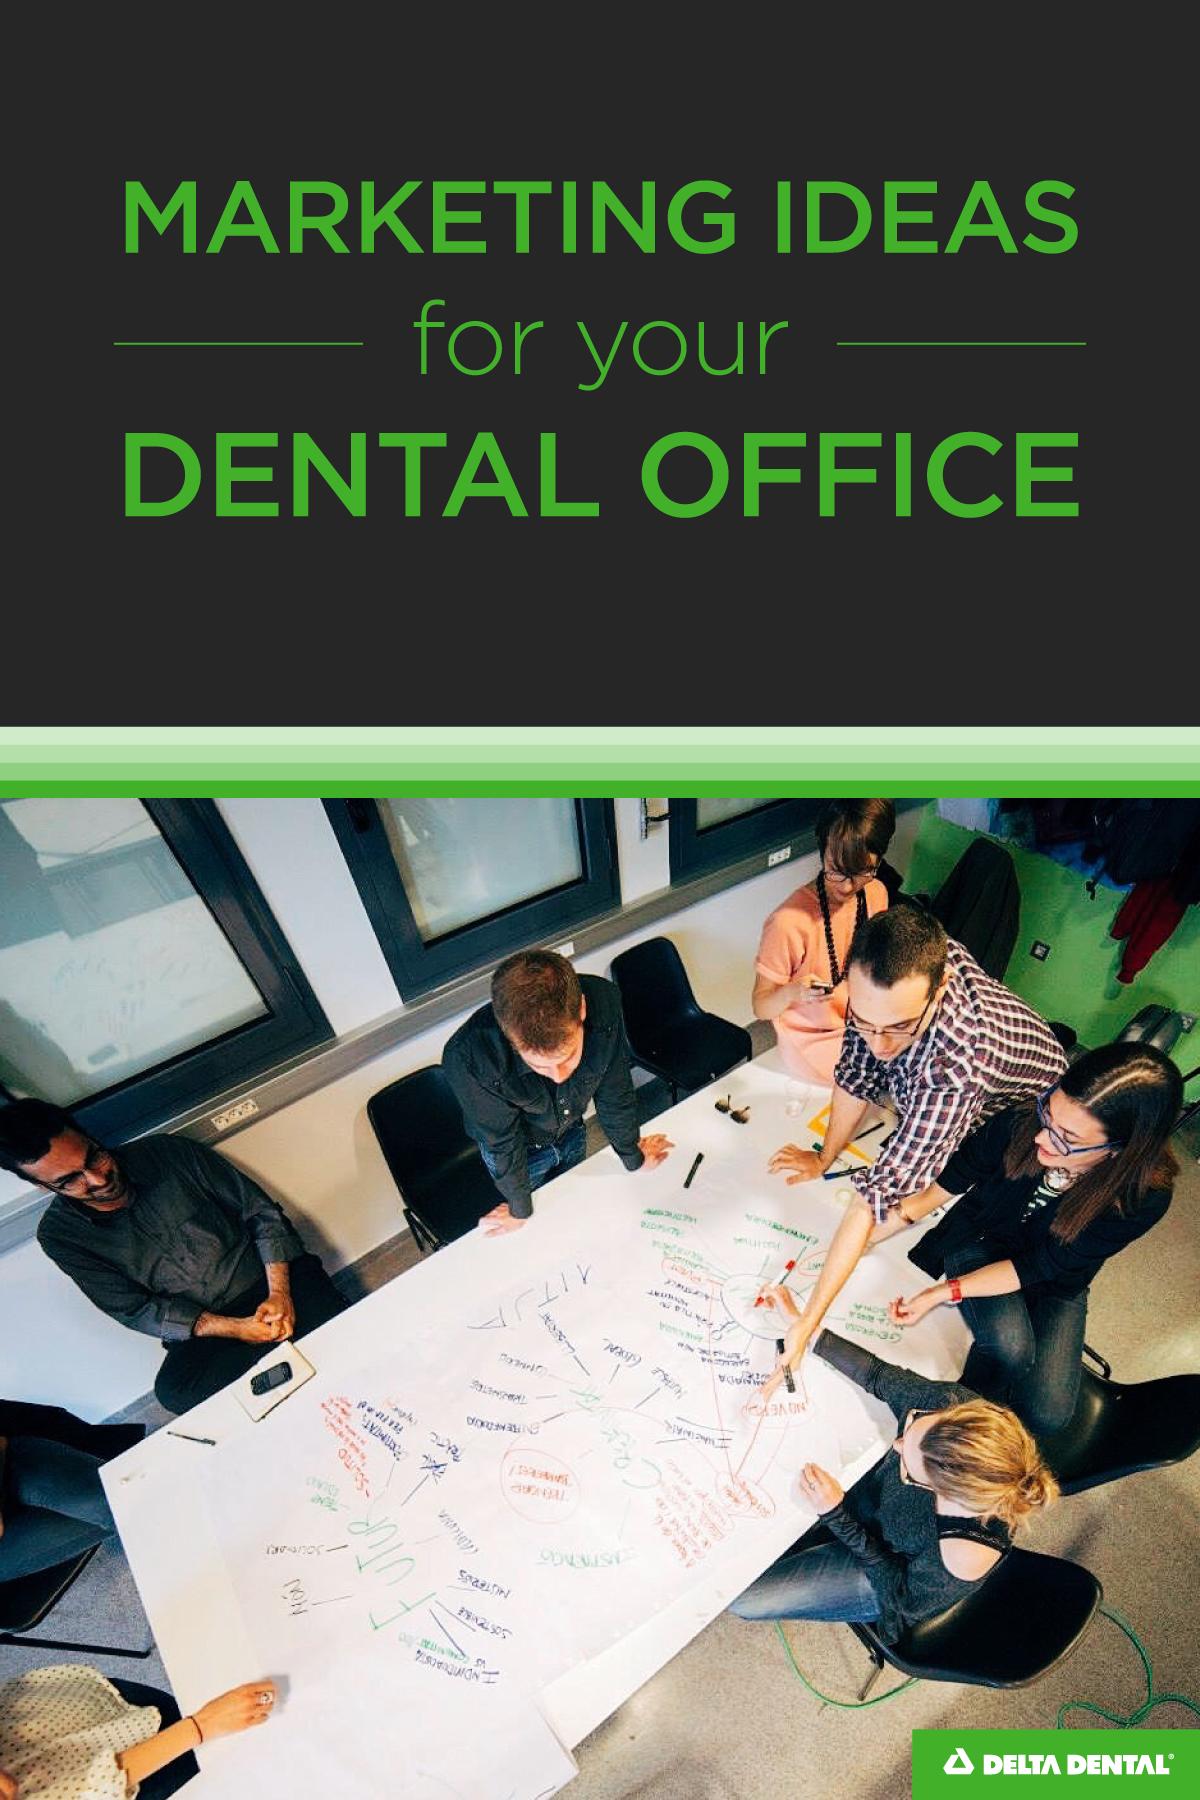 Marketing Ideas For Dental Offices Con Imagenes Dental